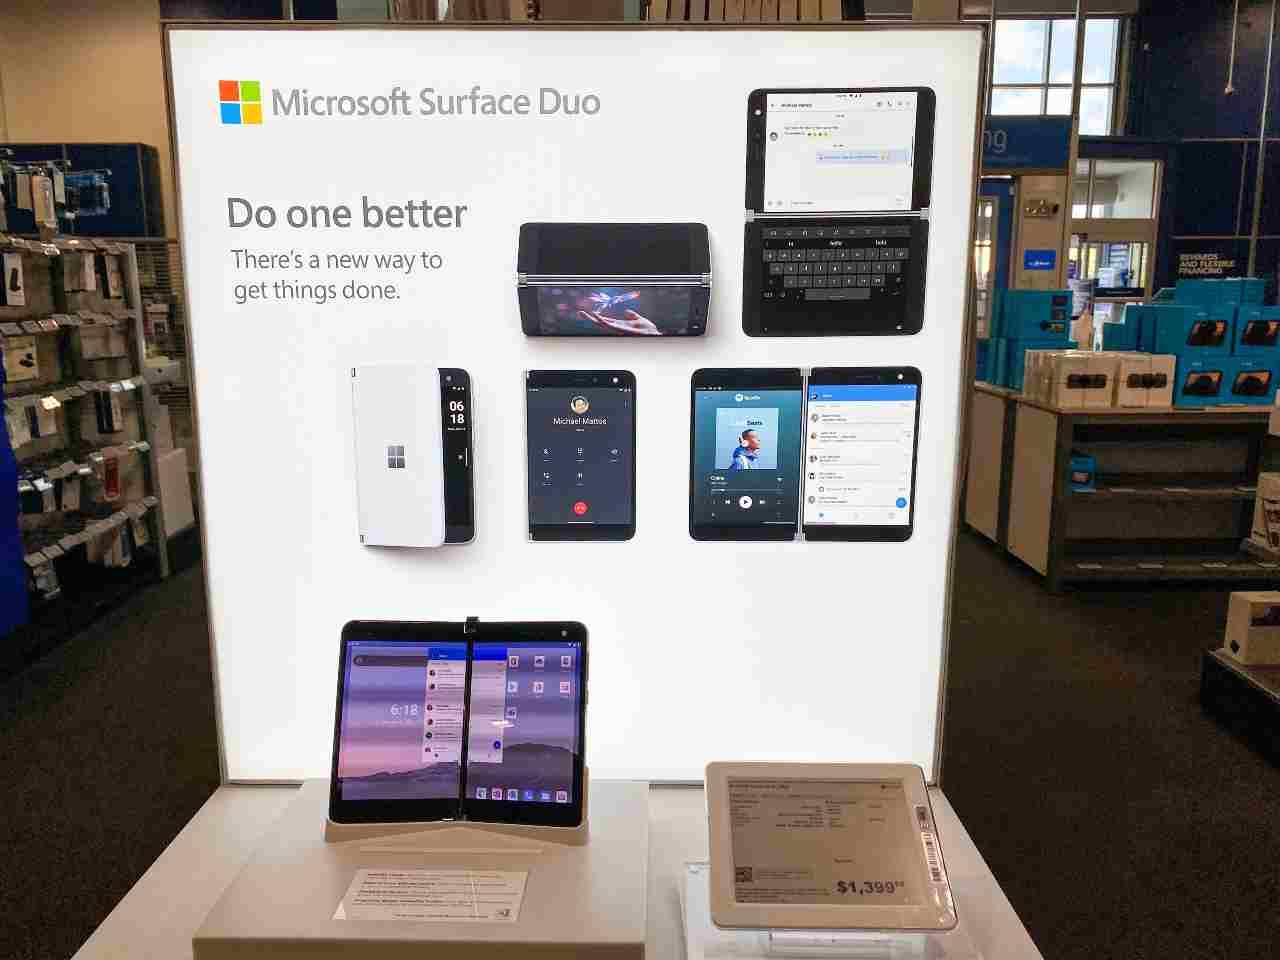 La gamma di device Microsoft Surface Duo - MeteoWeek.com